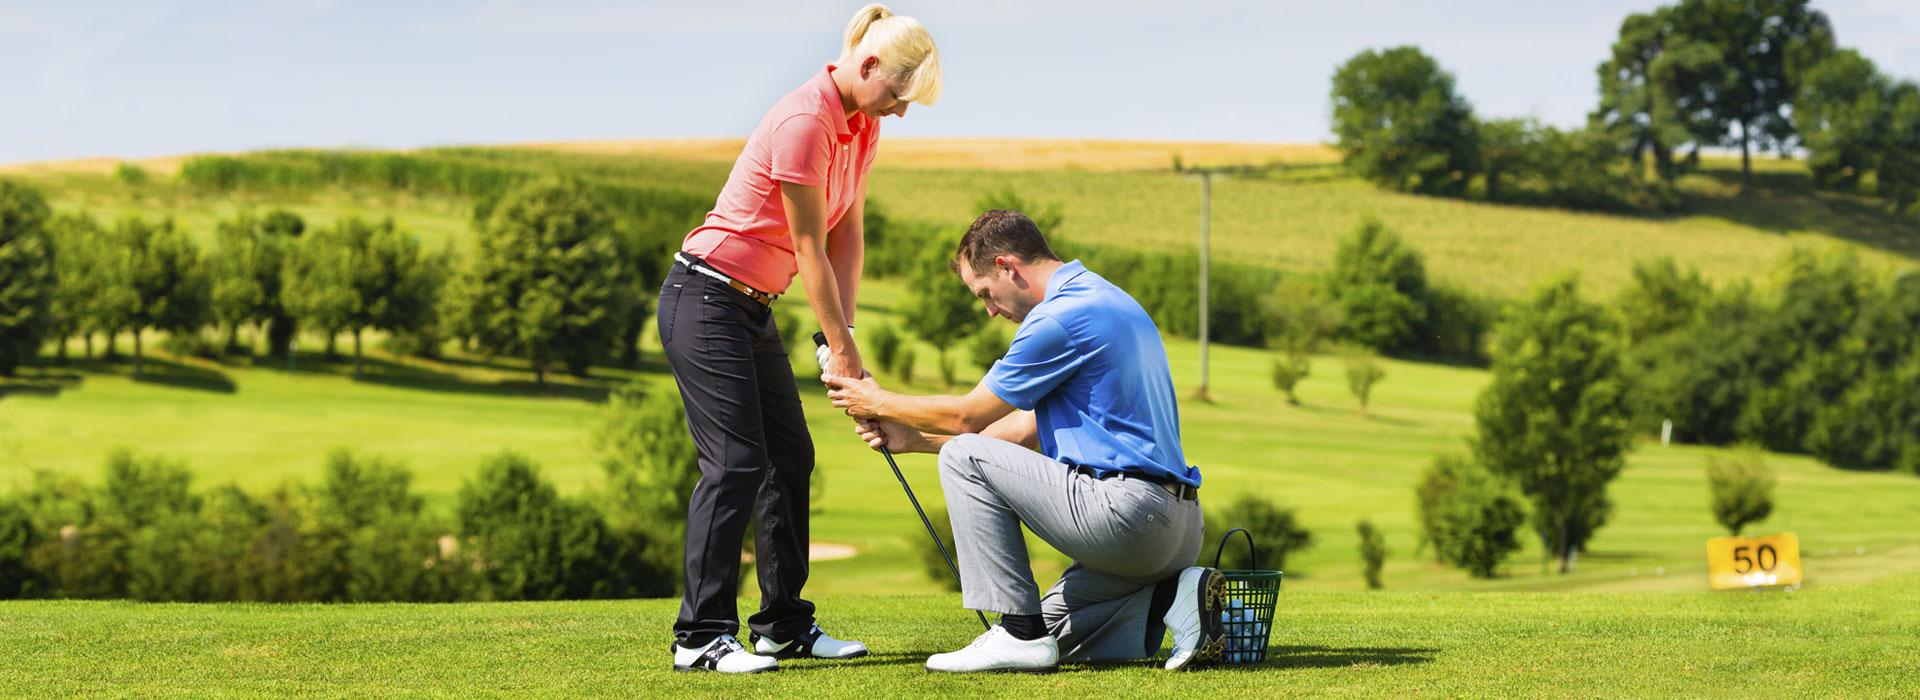 Golf Coach.jpg